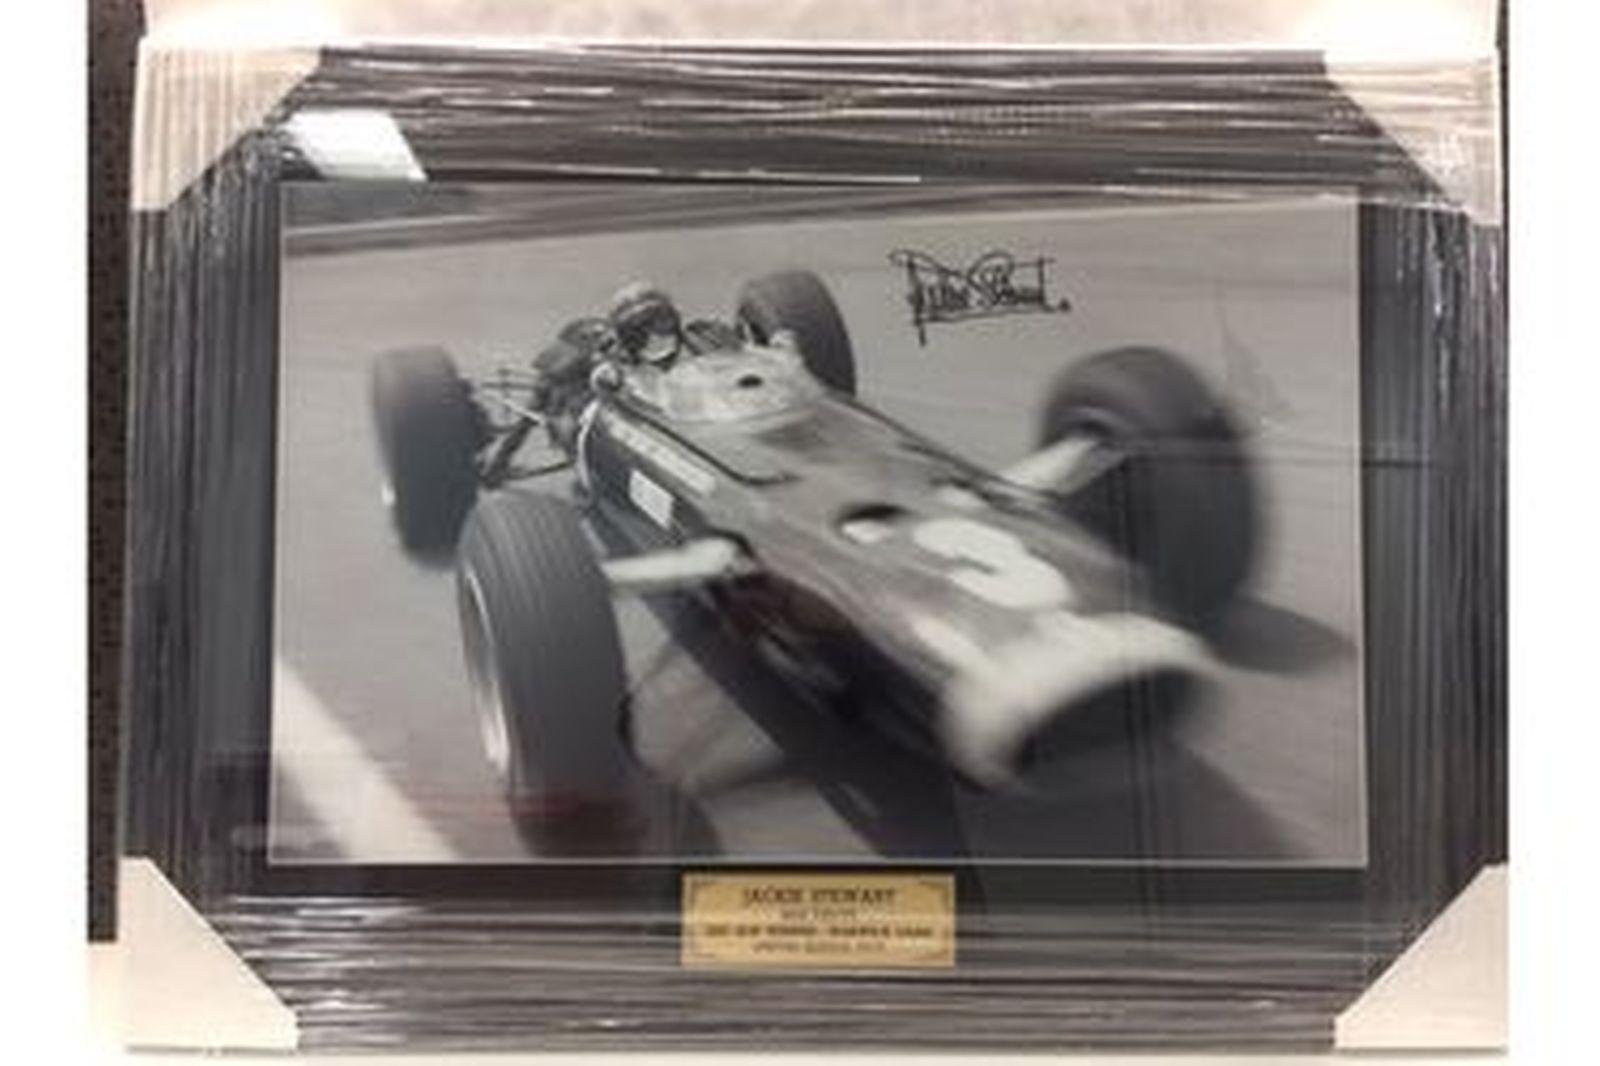 Framed Photo - Jackie Stewart 1967 Warwick Farm AGP Winner (75 x 55cm)